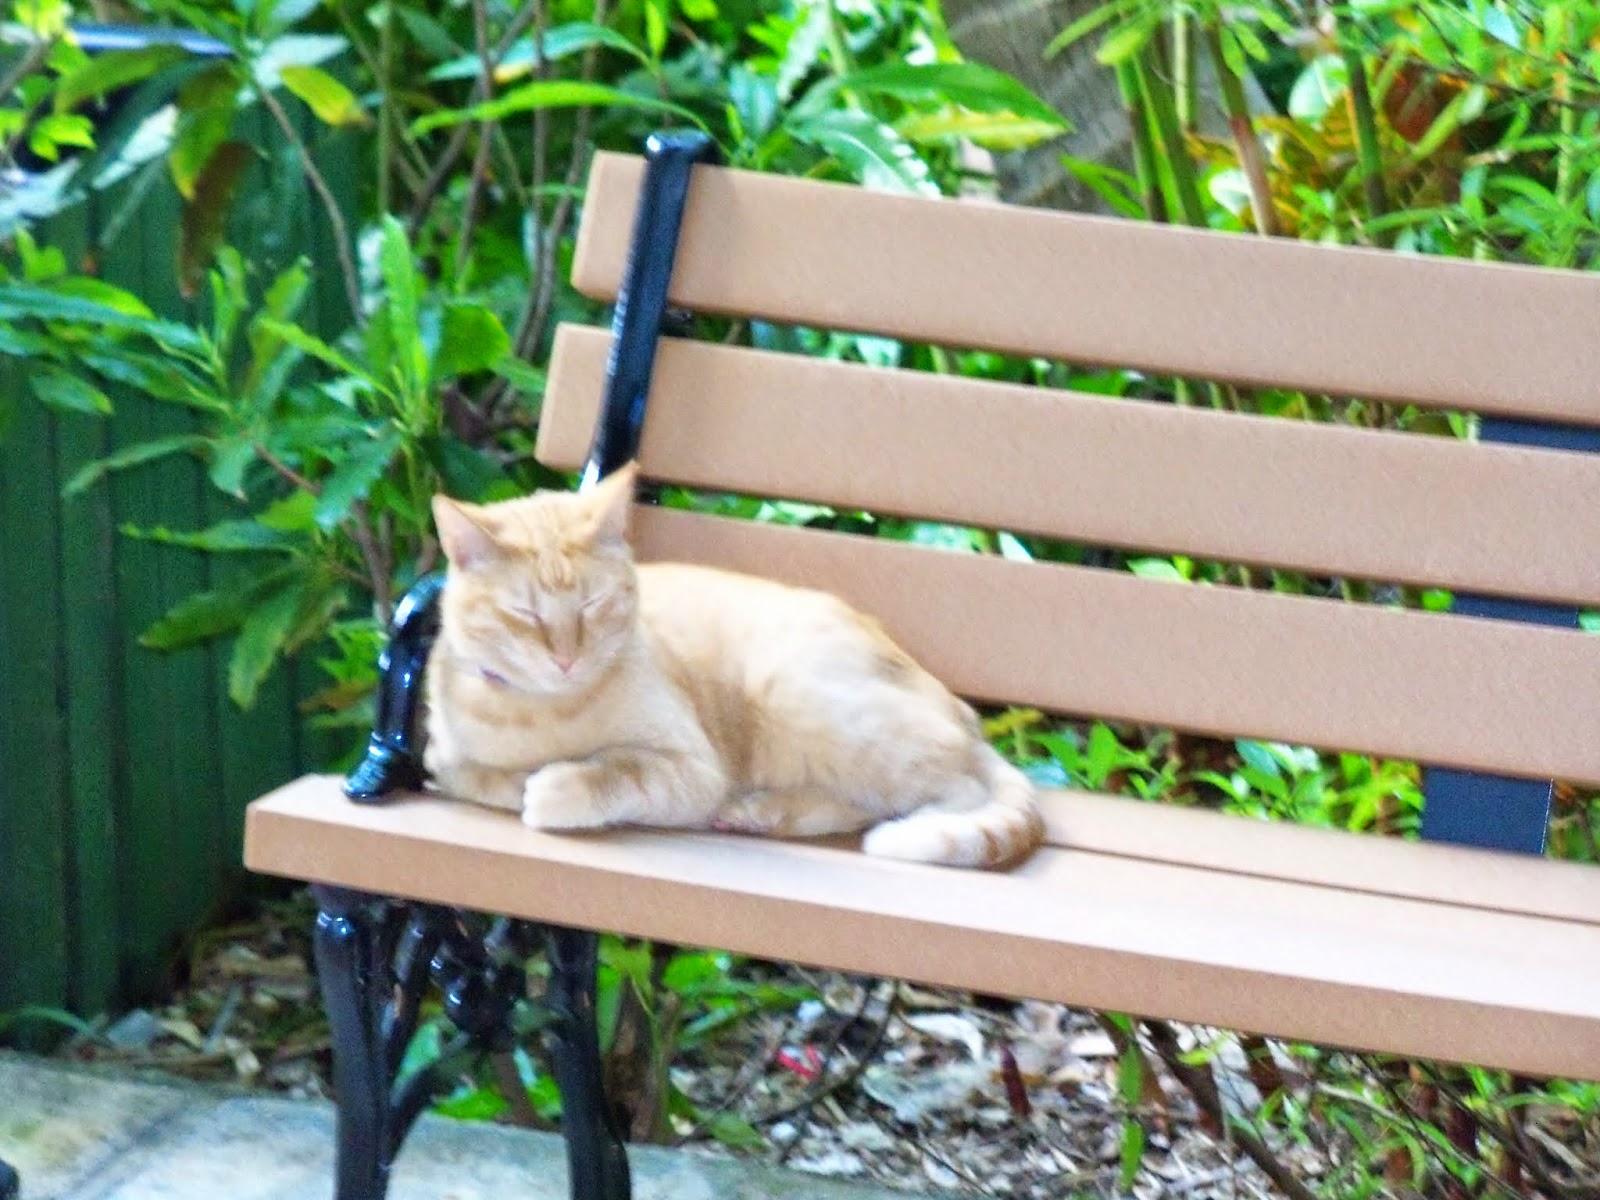 Key West Vacation - 116_5412.JPG